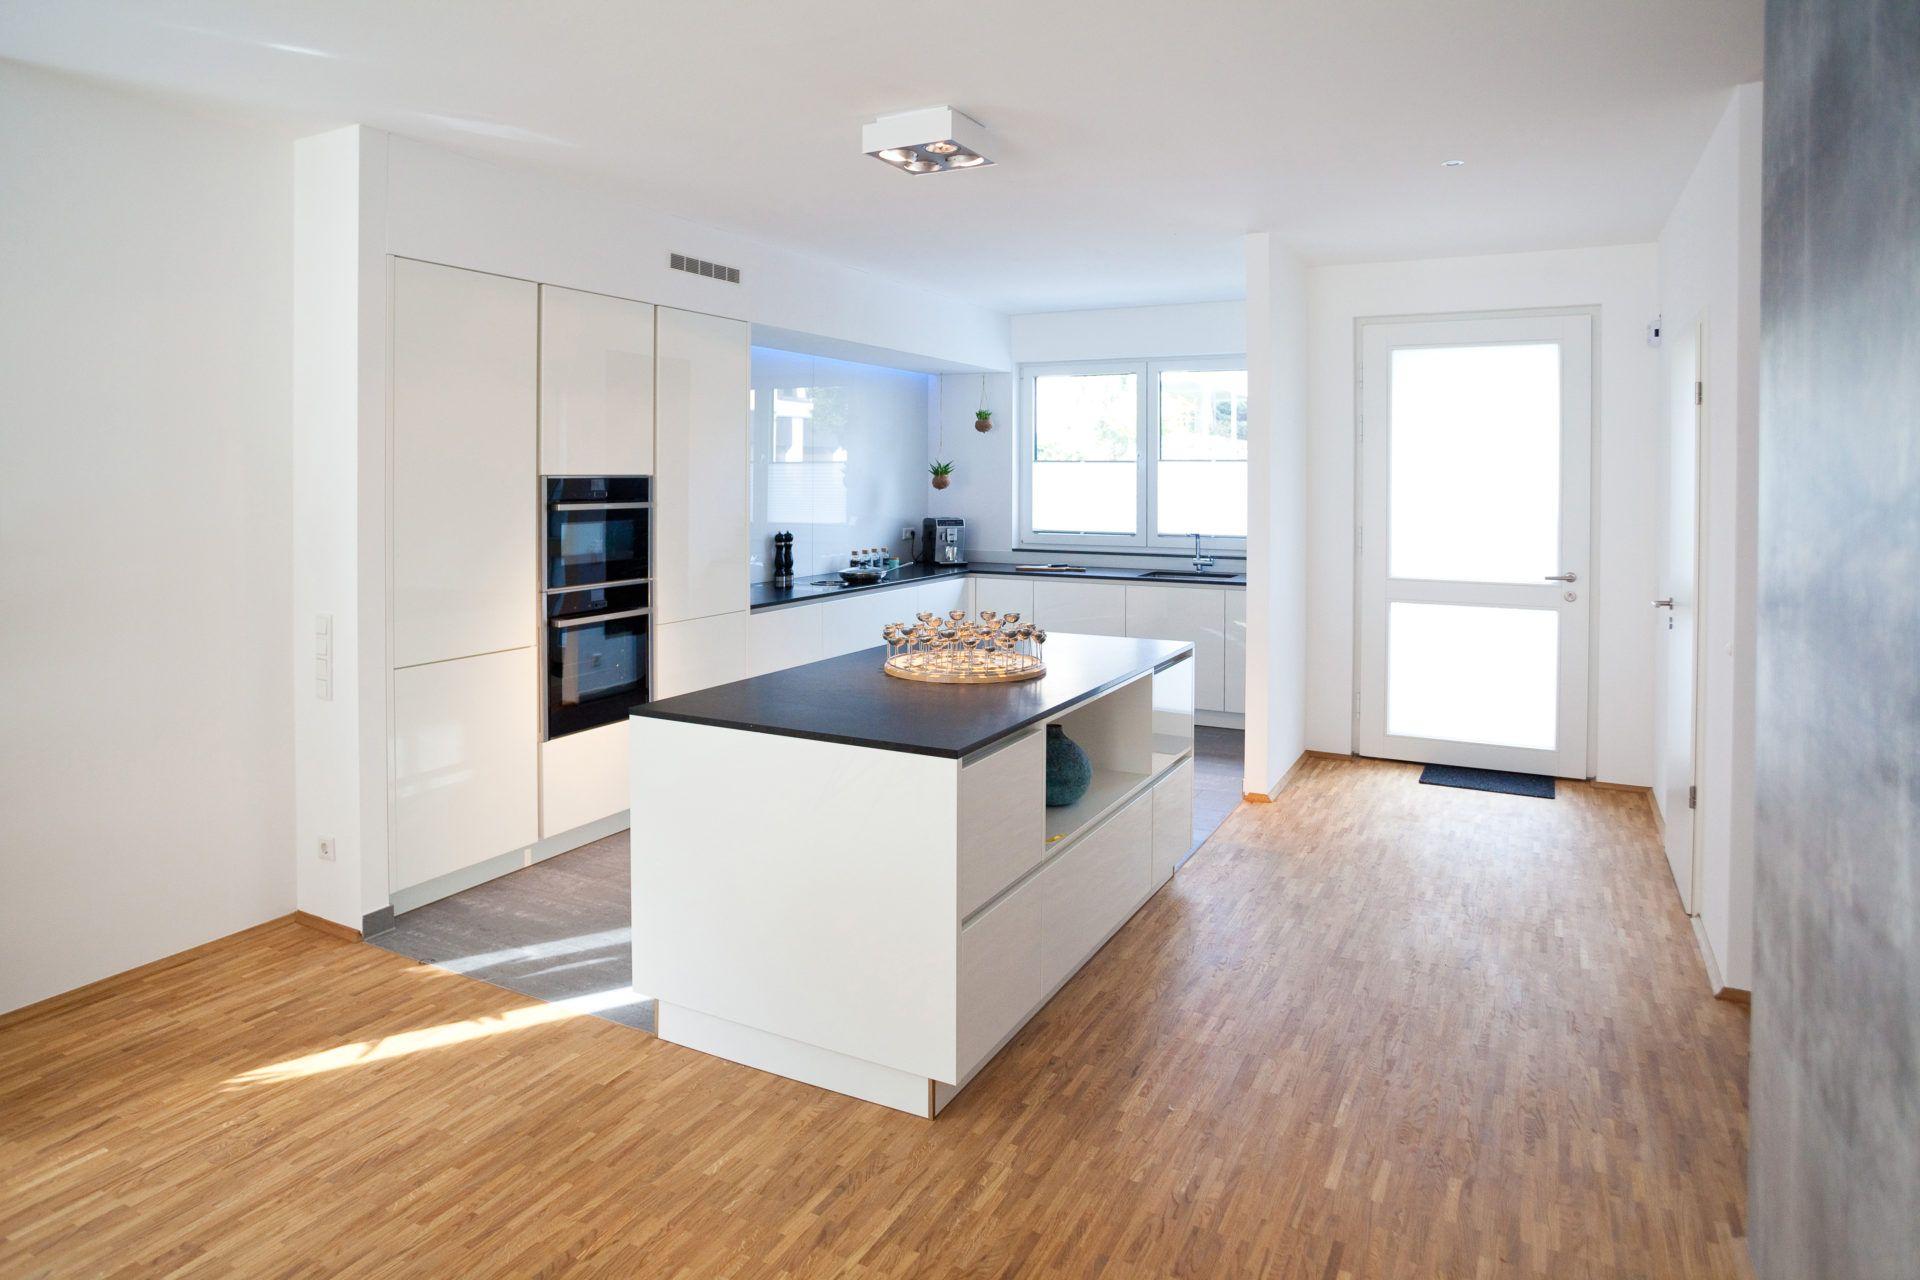 k chen kaufen bonn gebrauchte kche essen fabulous. Black Bedroom Furniture Sets. Home Design Ideas